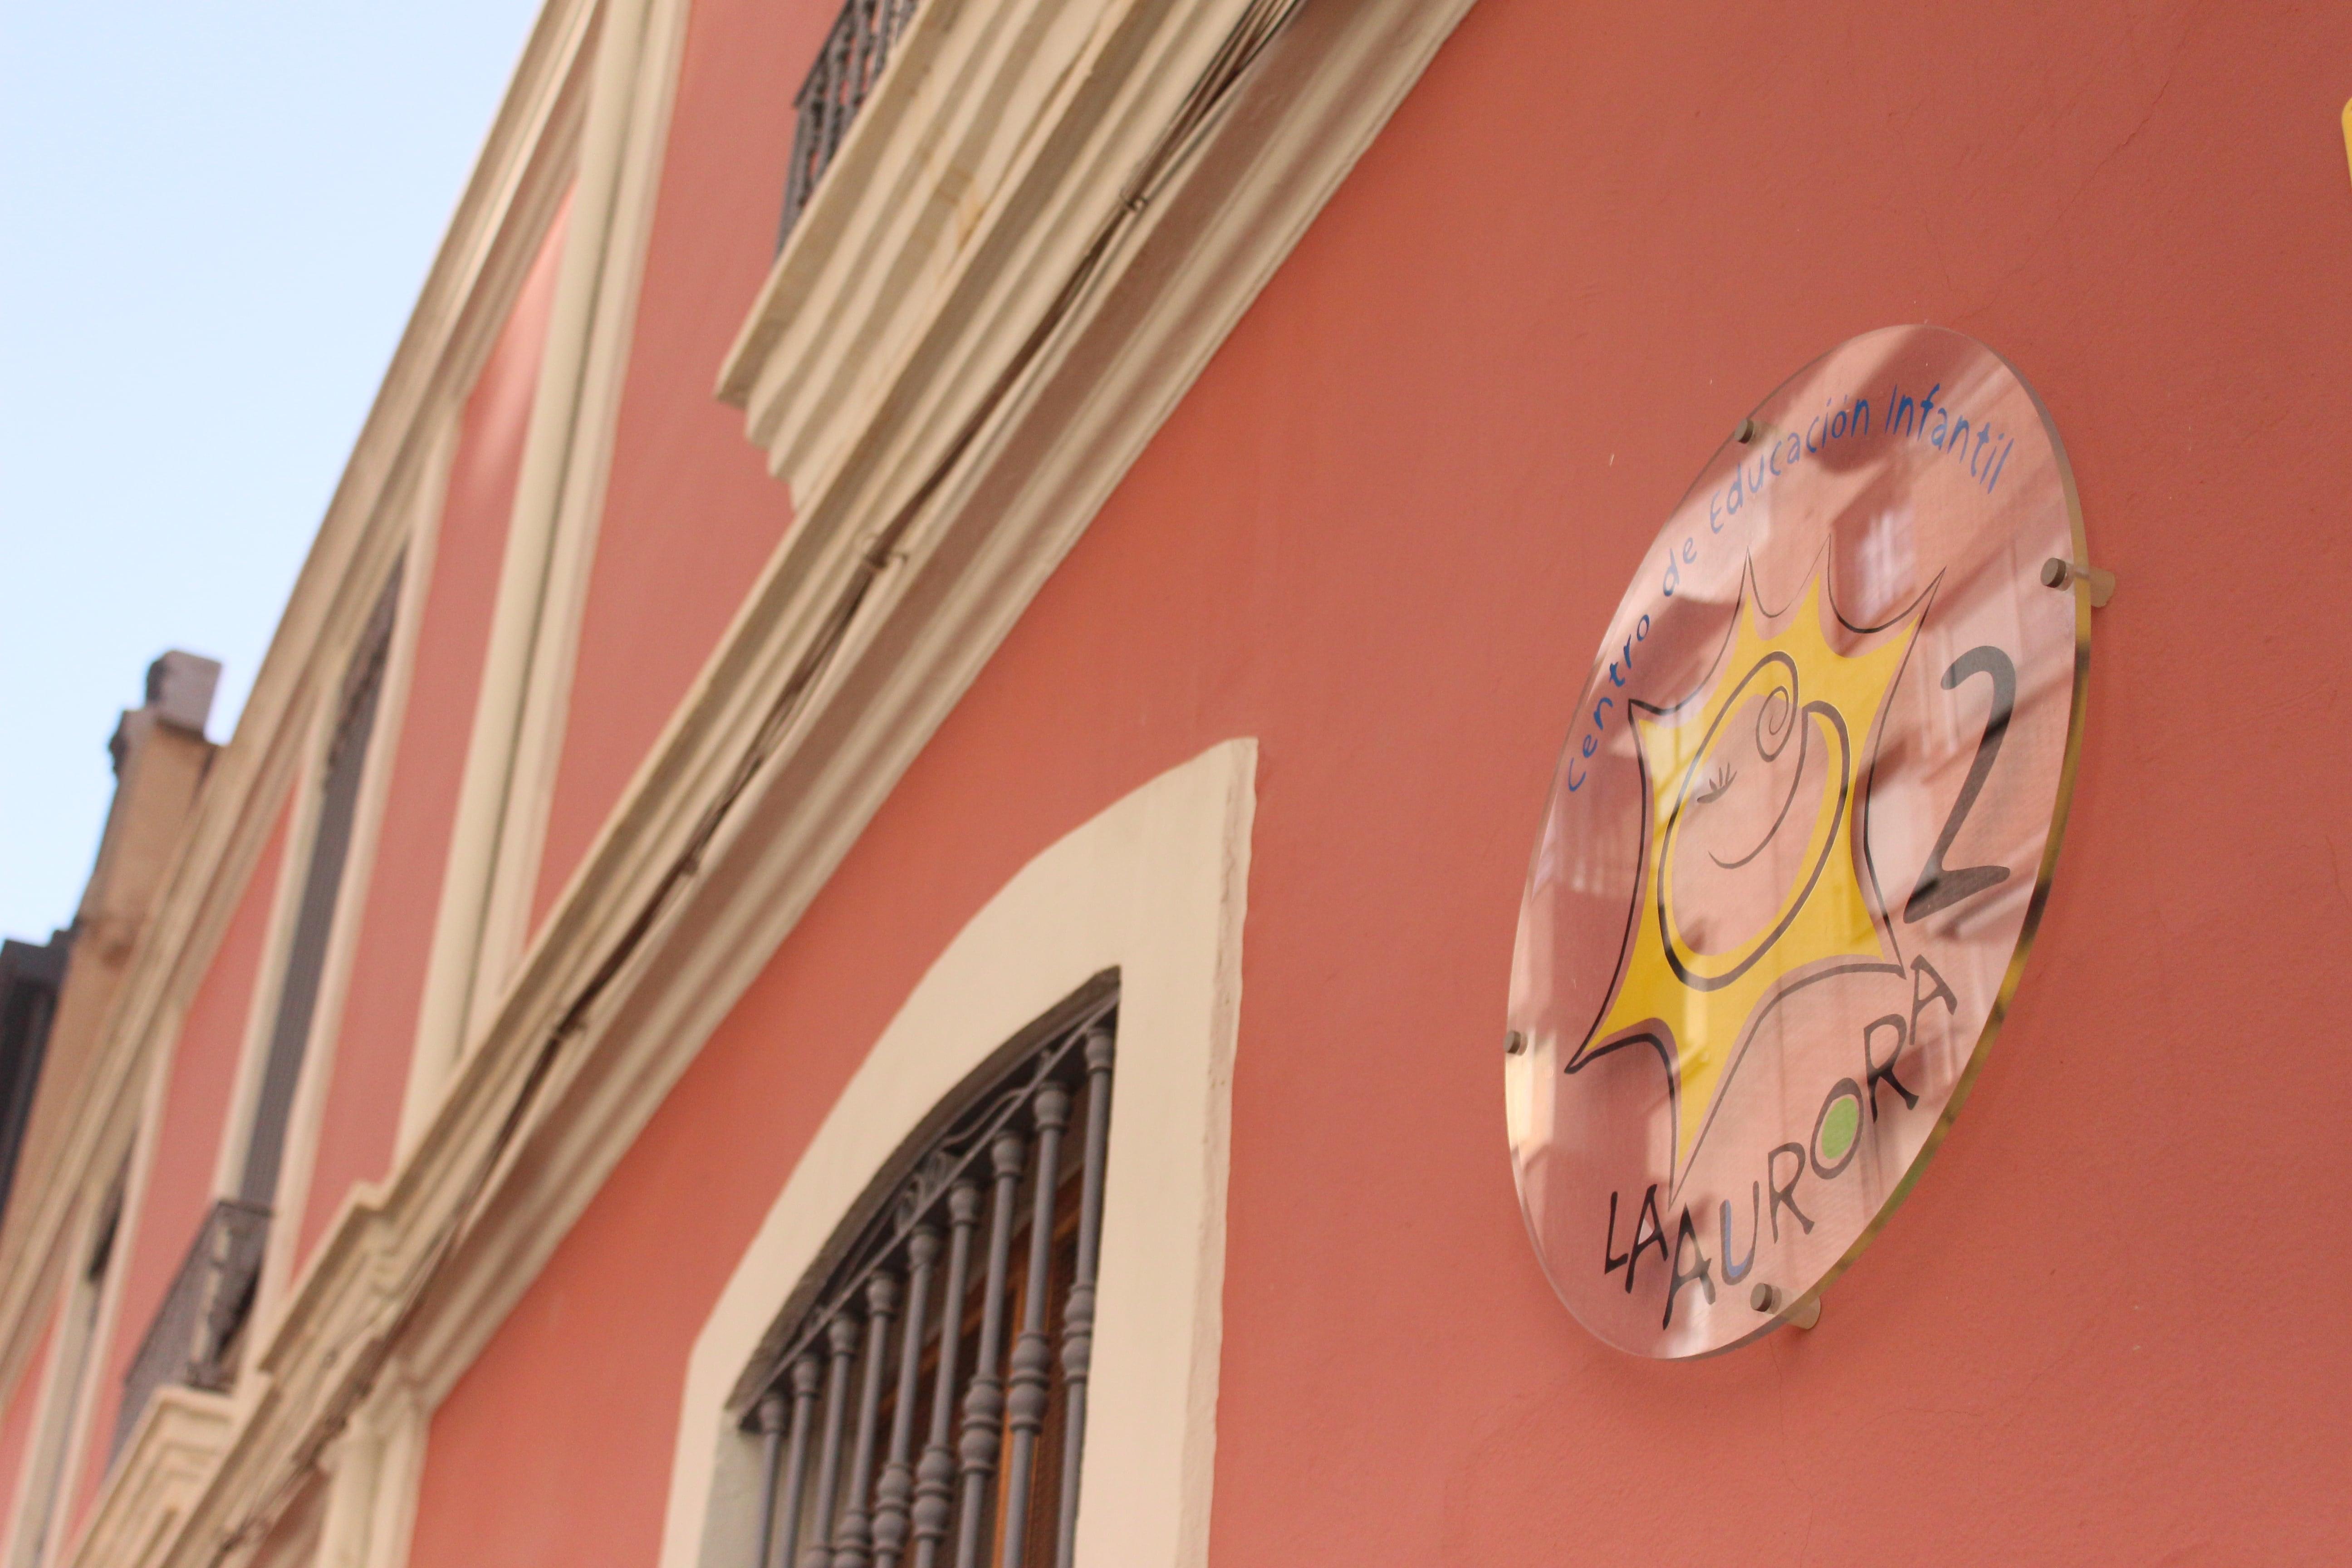 escuela infantil bilingüe en Valencia - la aurora 2